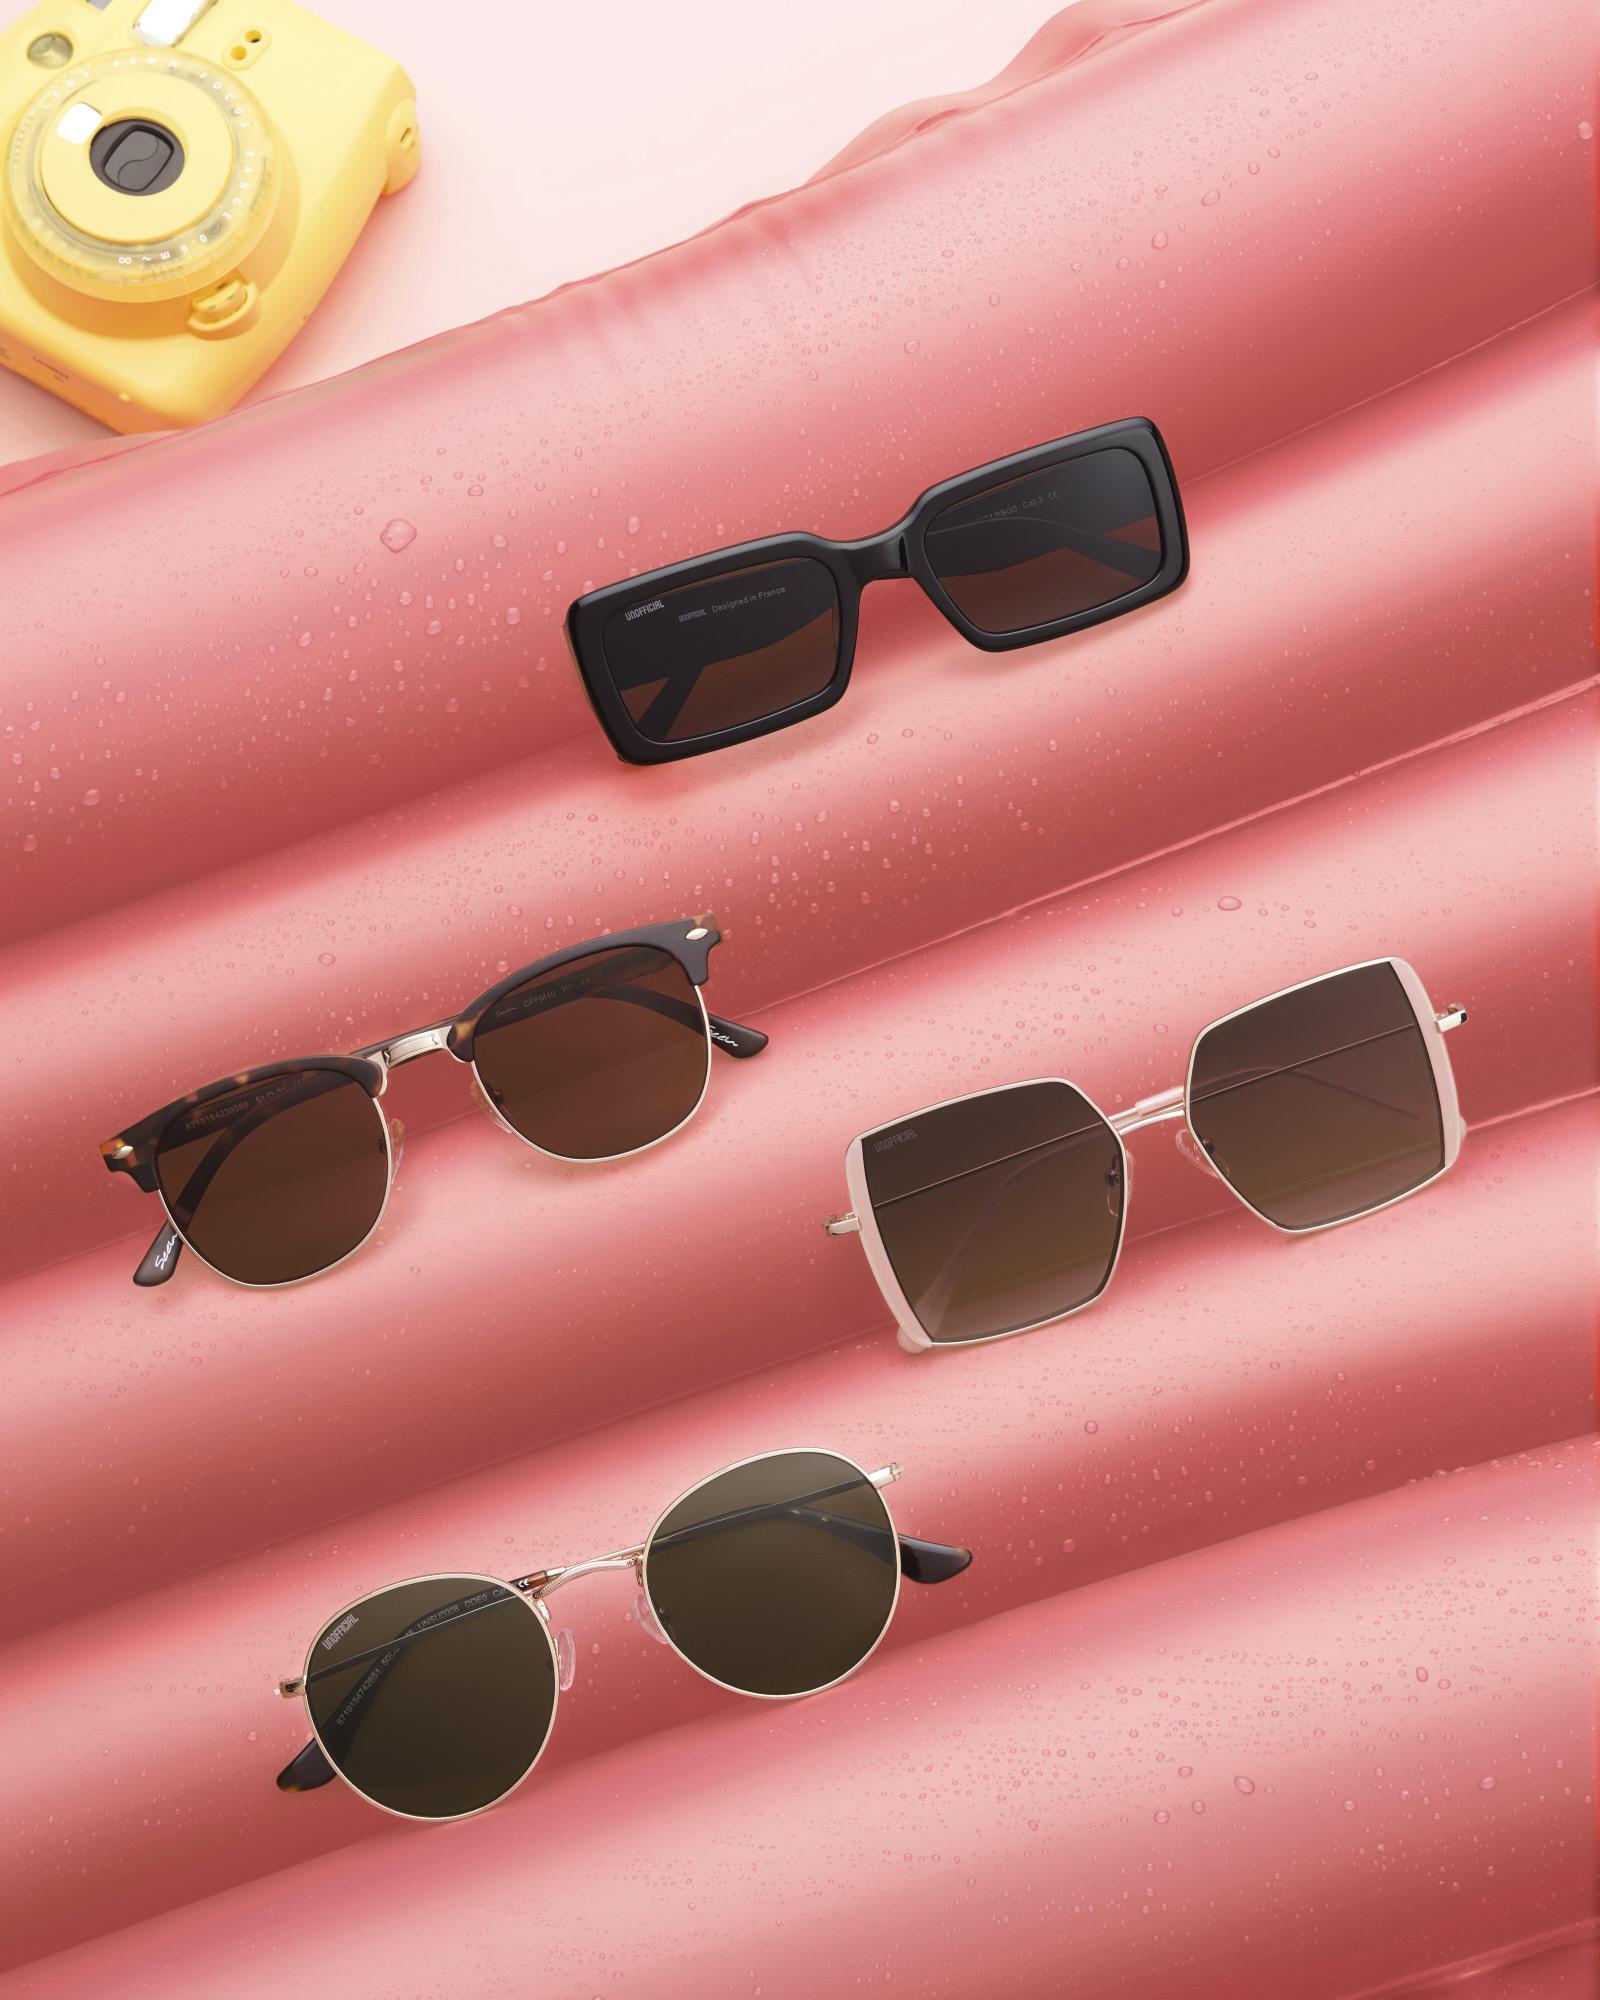 bernd-westphal-stillstars-apollo-optik-sunglasses-still-life-photography-003